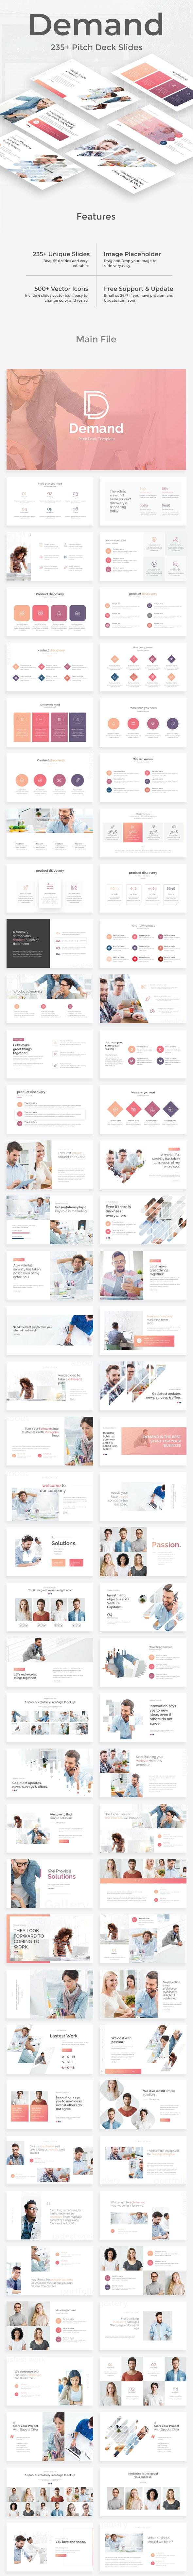 Demand Management Pitch Deck Powerpoint Template - Business PowerPoint Templates